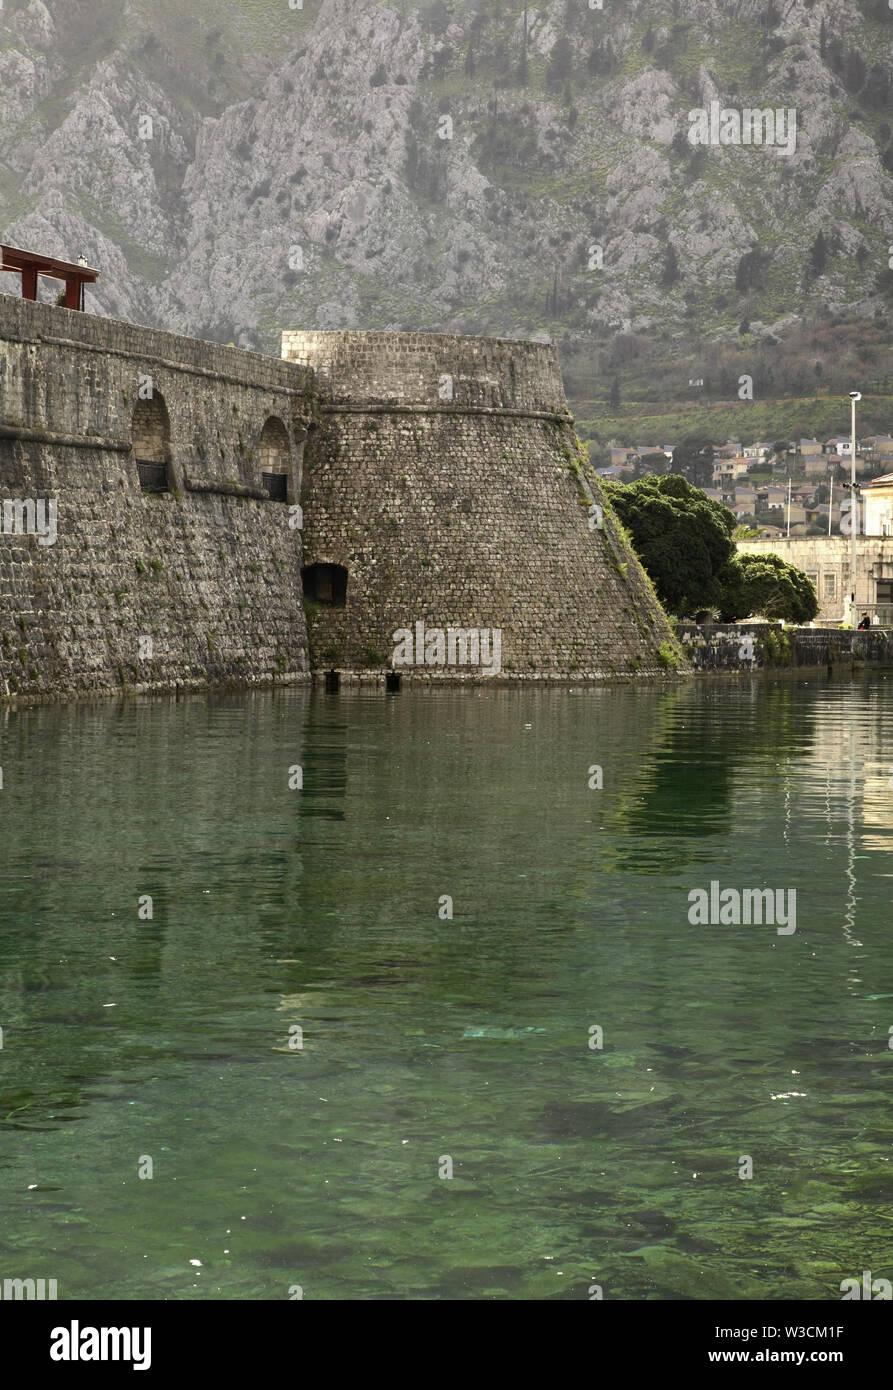 City walls in Kotor. Montenegro - Stock Image